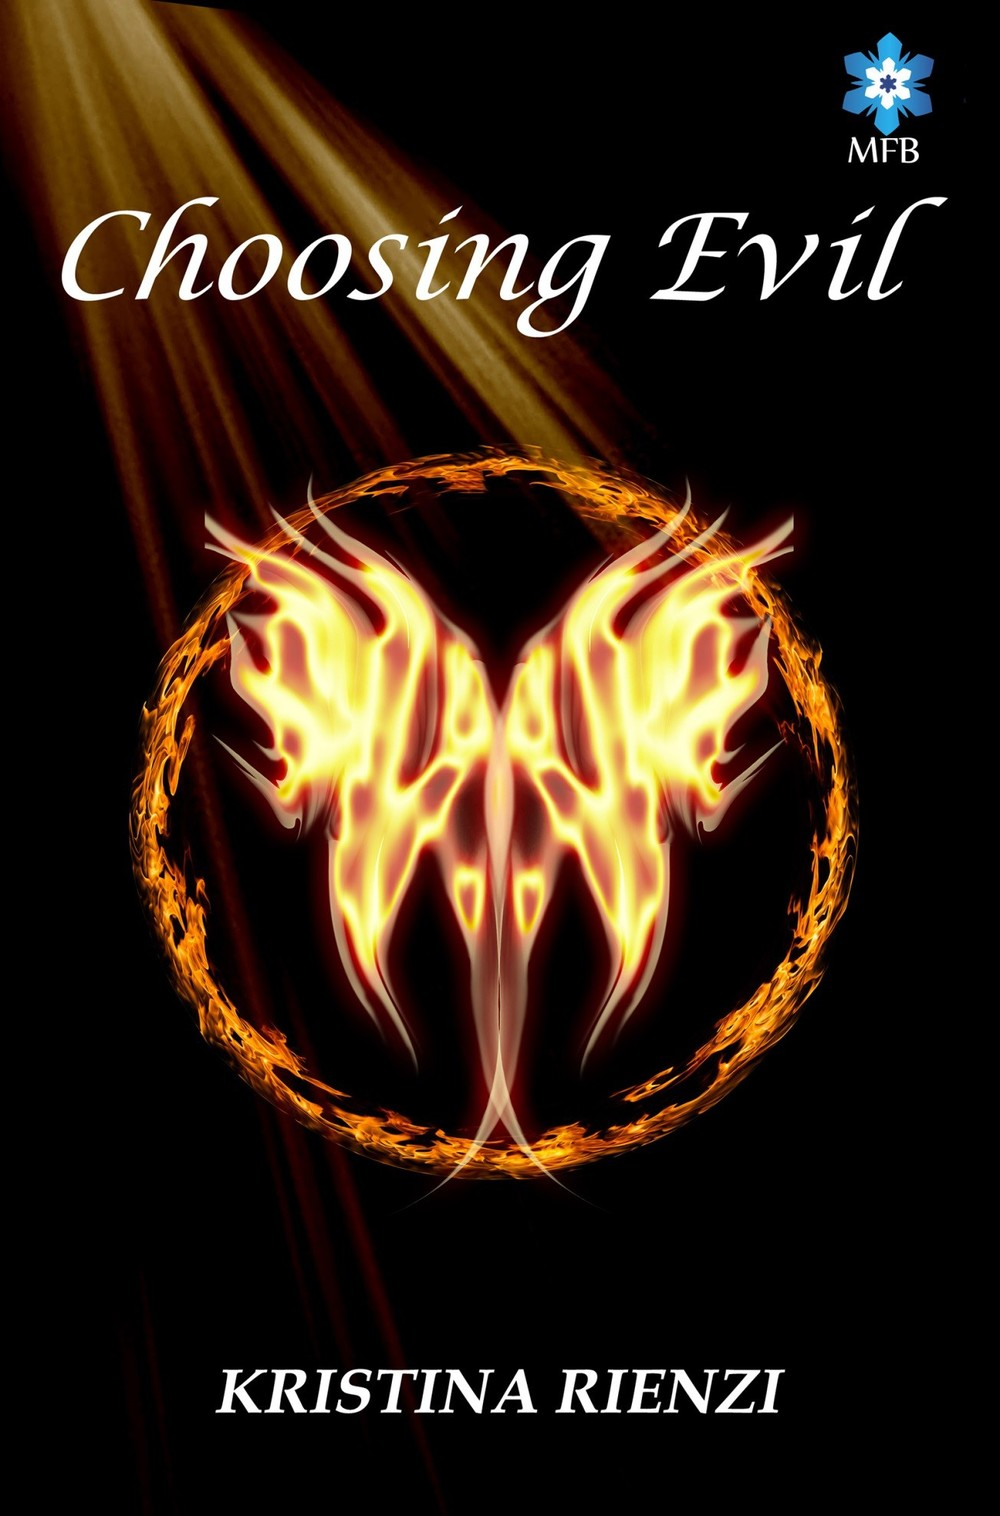 Choosing Evil by Kritstina Rienzi